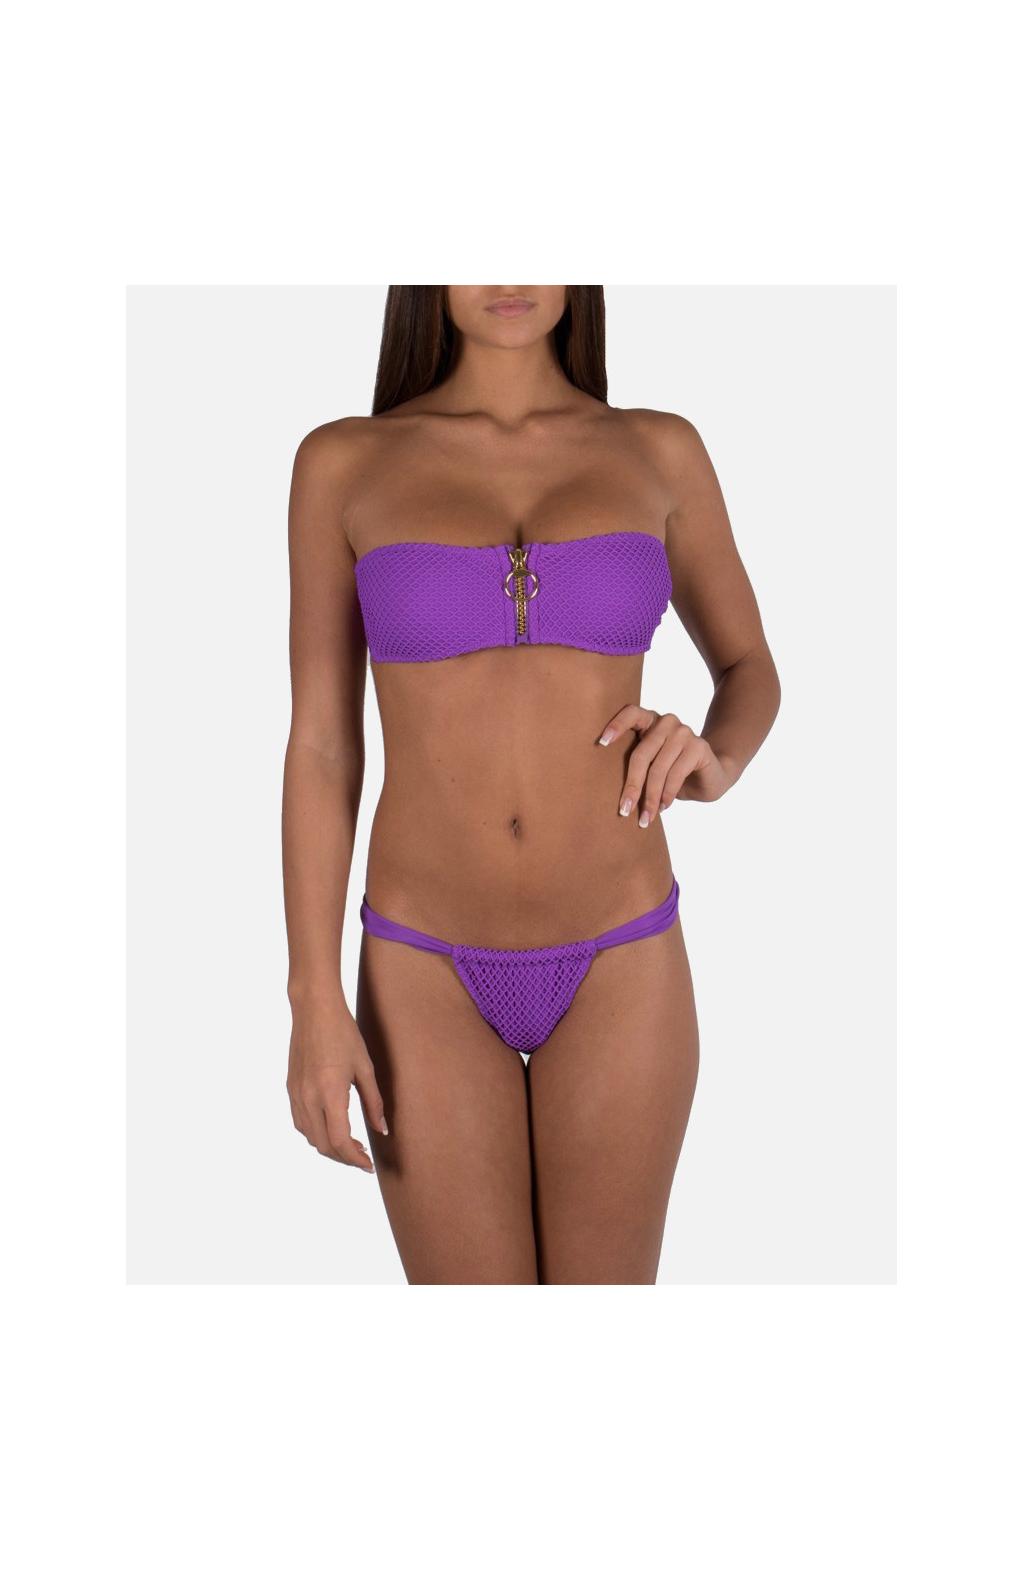 Net Bandeau Bikini with Central Zip